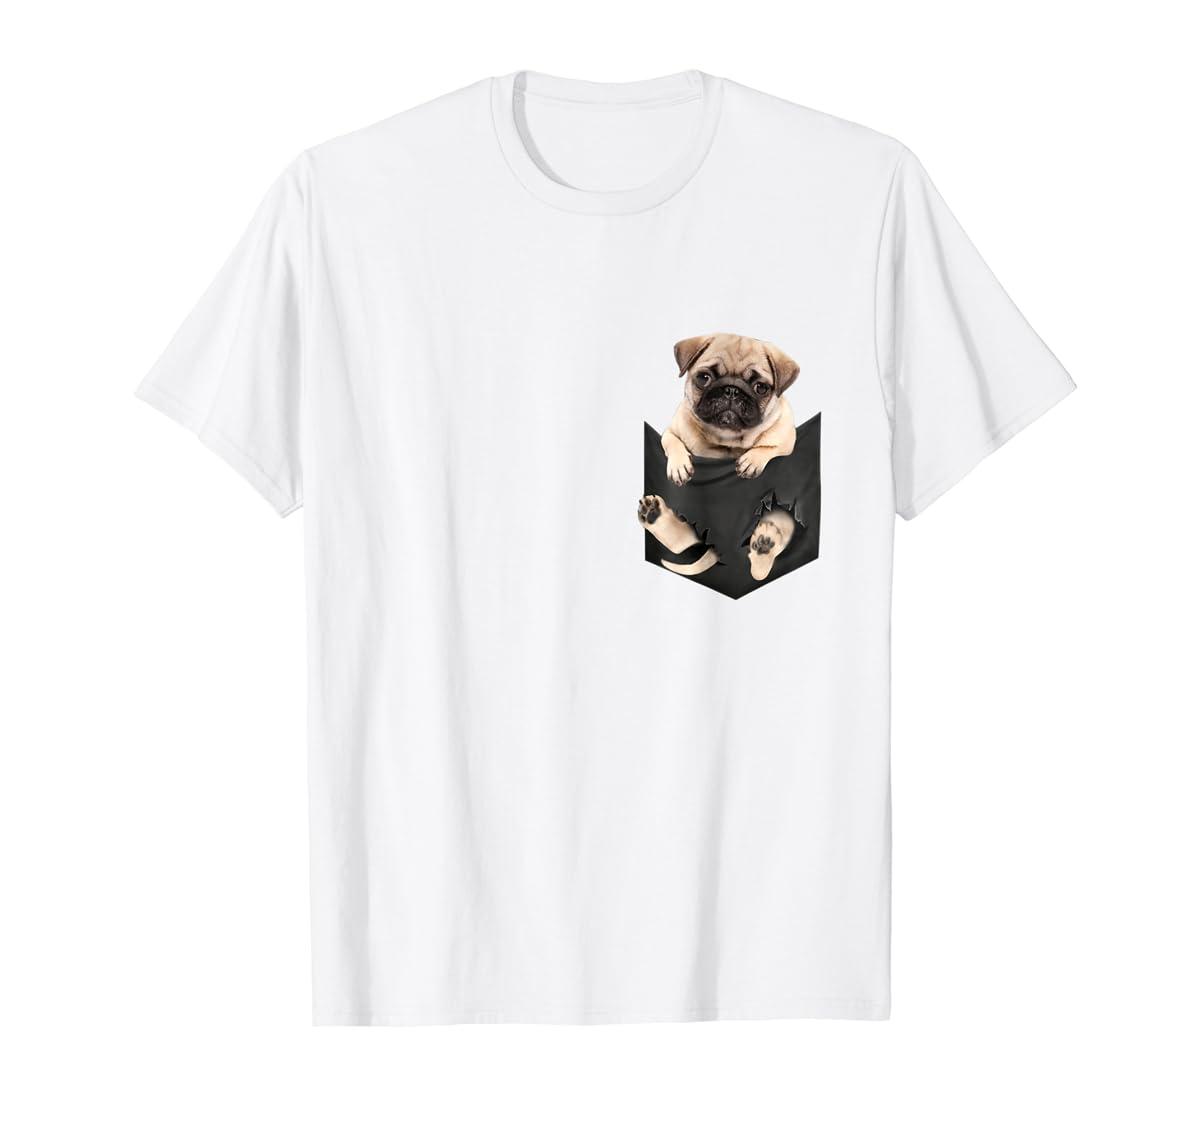 Dog in Your Pocket santa hat pug lover gift shirt-Men's T-Shirt-White